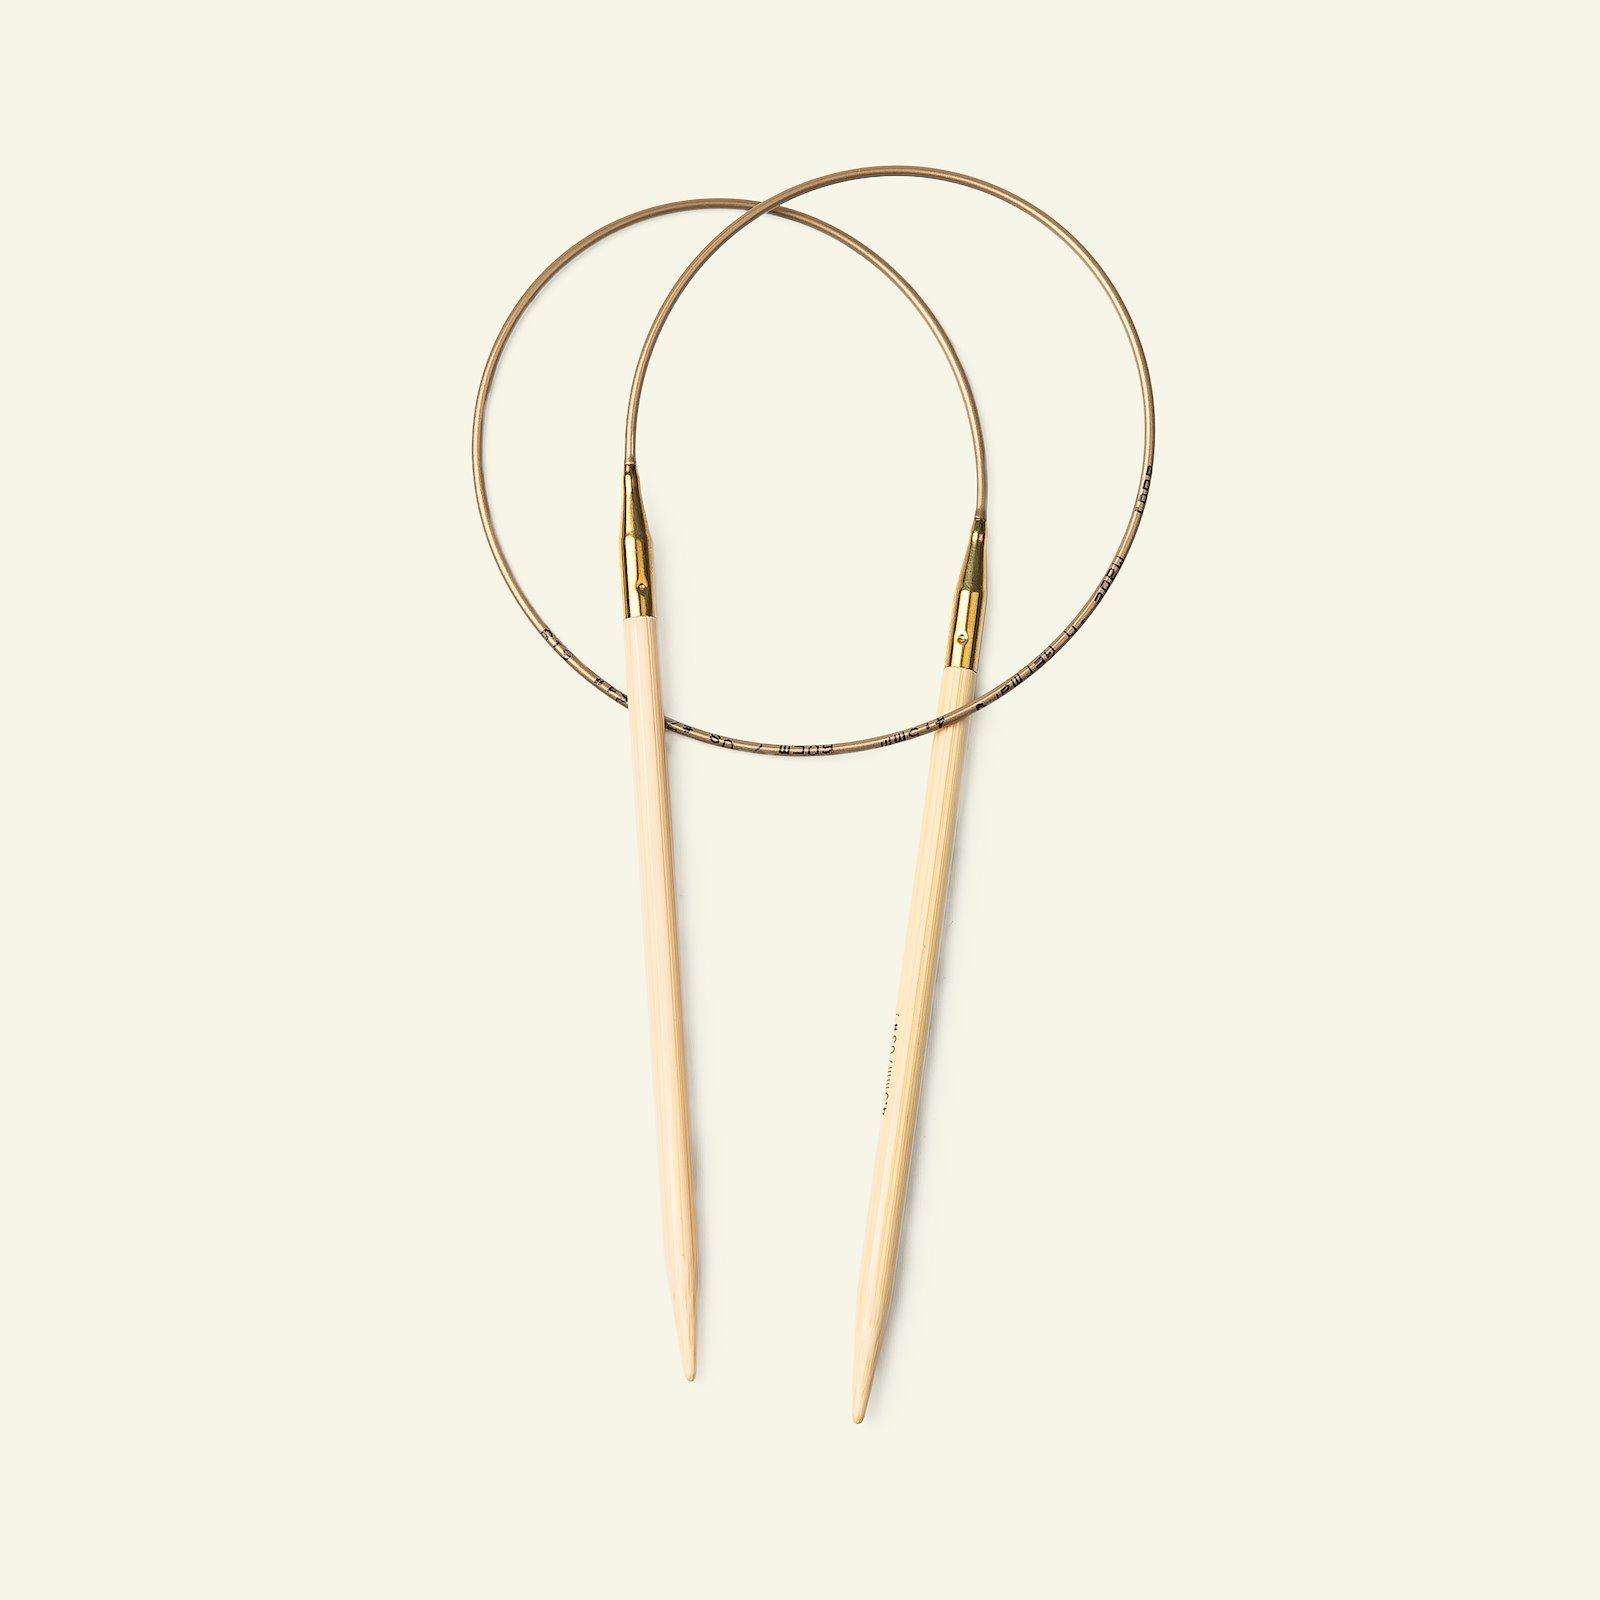 Addi circular needle bamboo 60cm 3mm 83110_pack